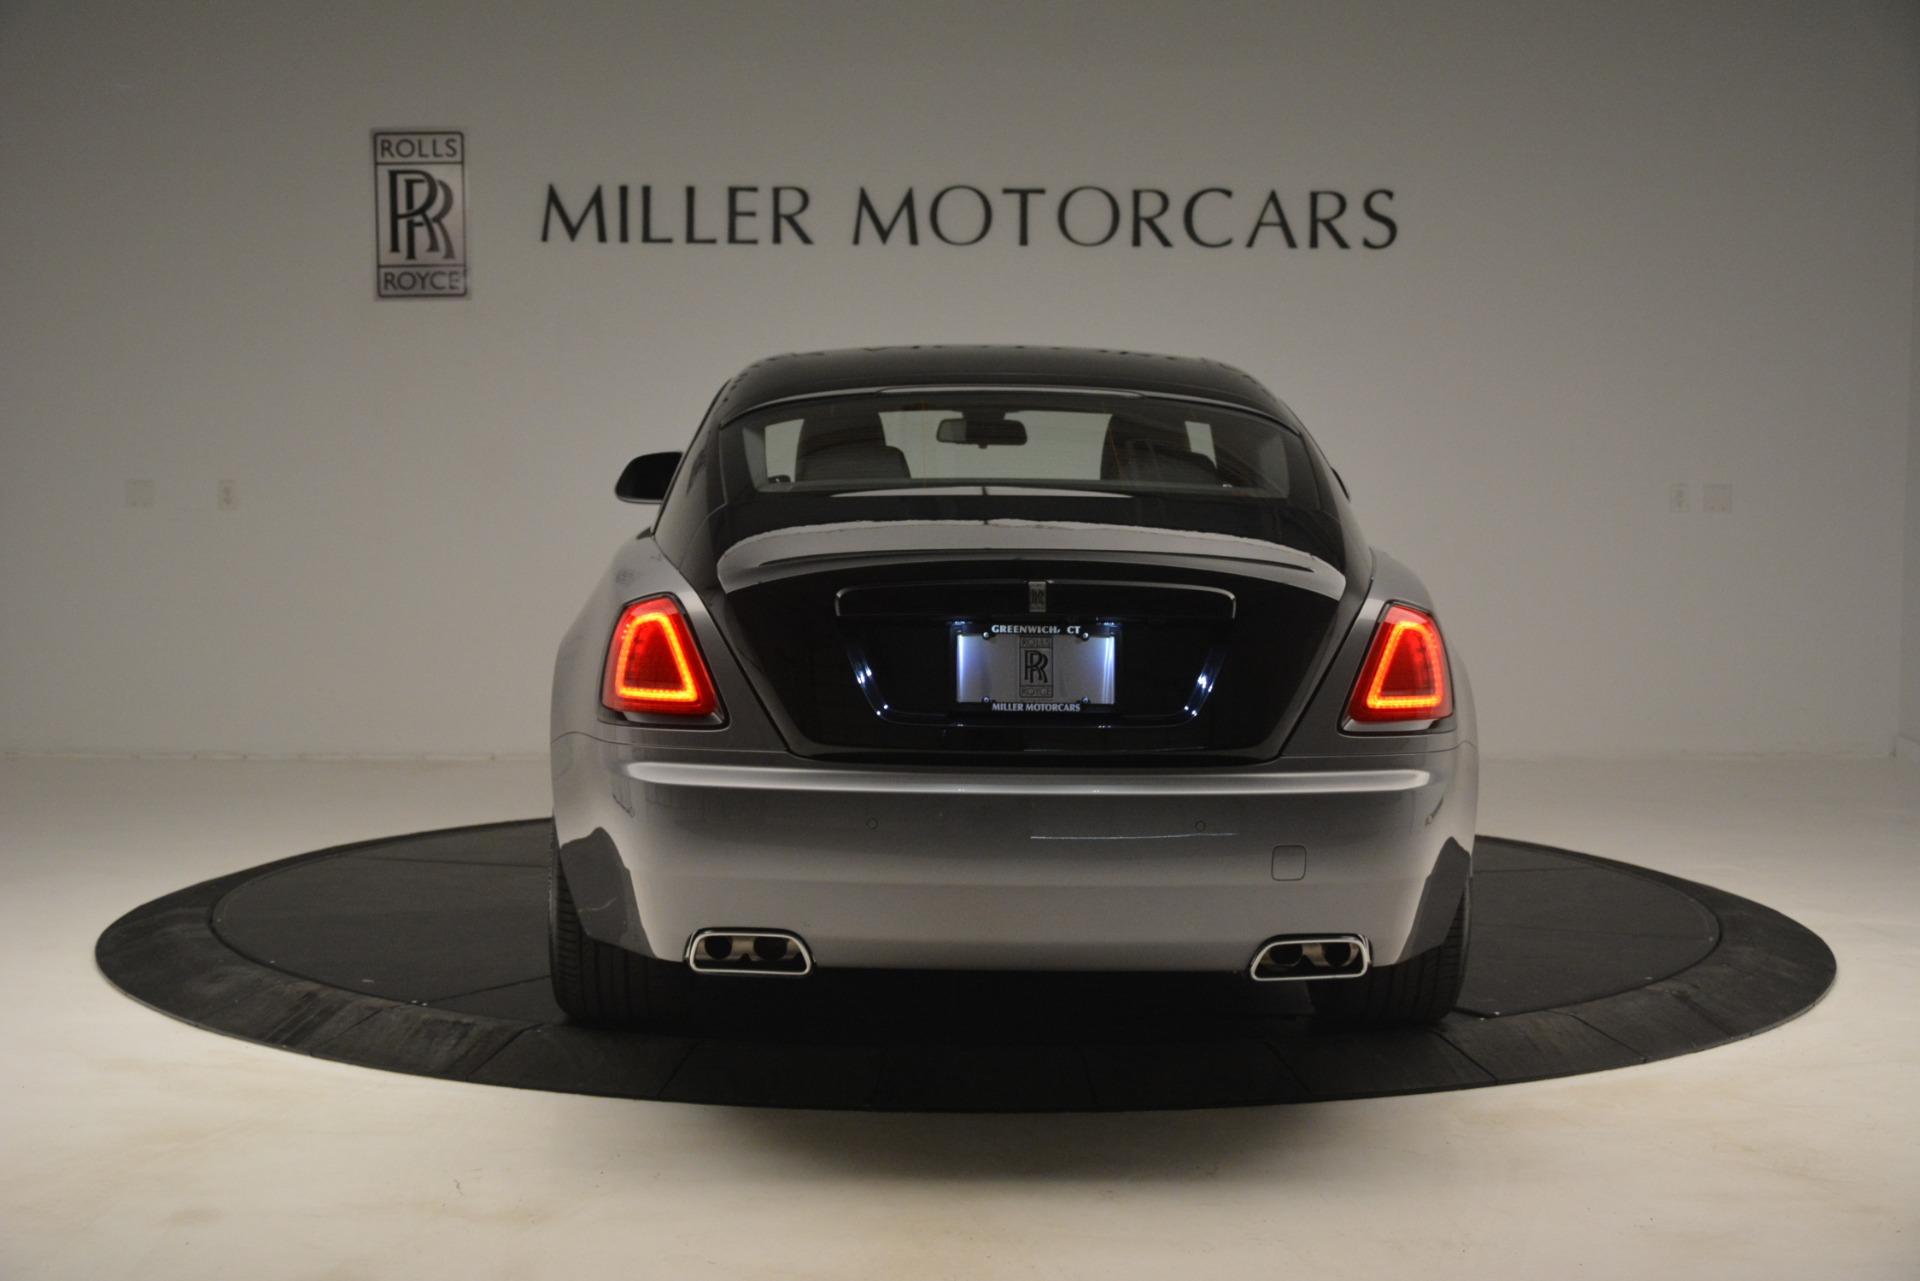 Used 2019 Rolls Royce Wraith